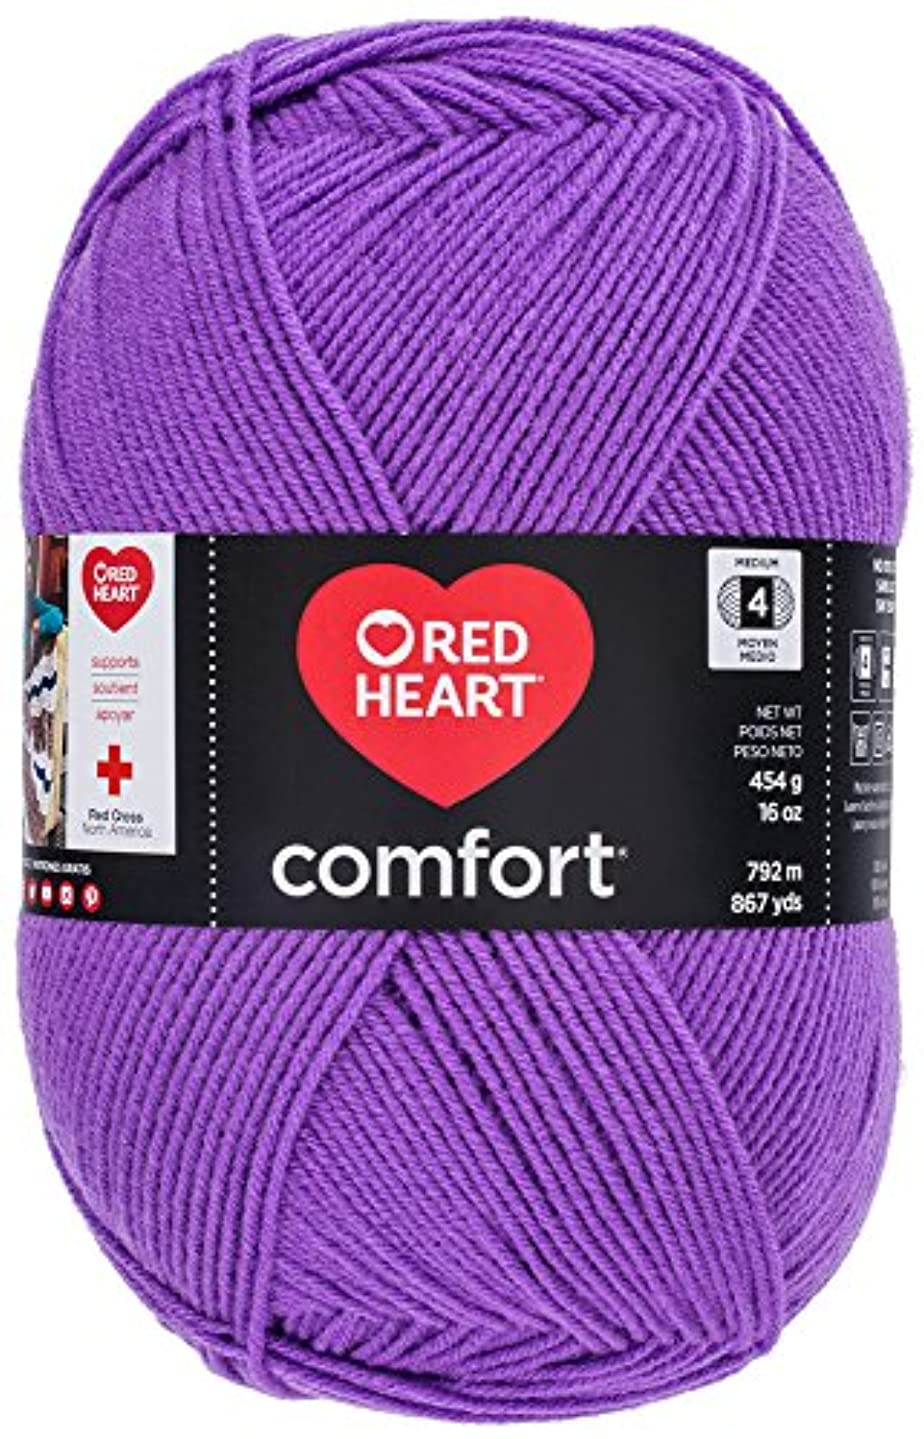 Red Heart Comfort Yarn, Amethyst